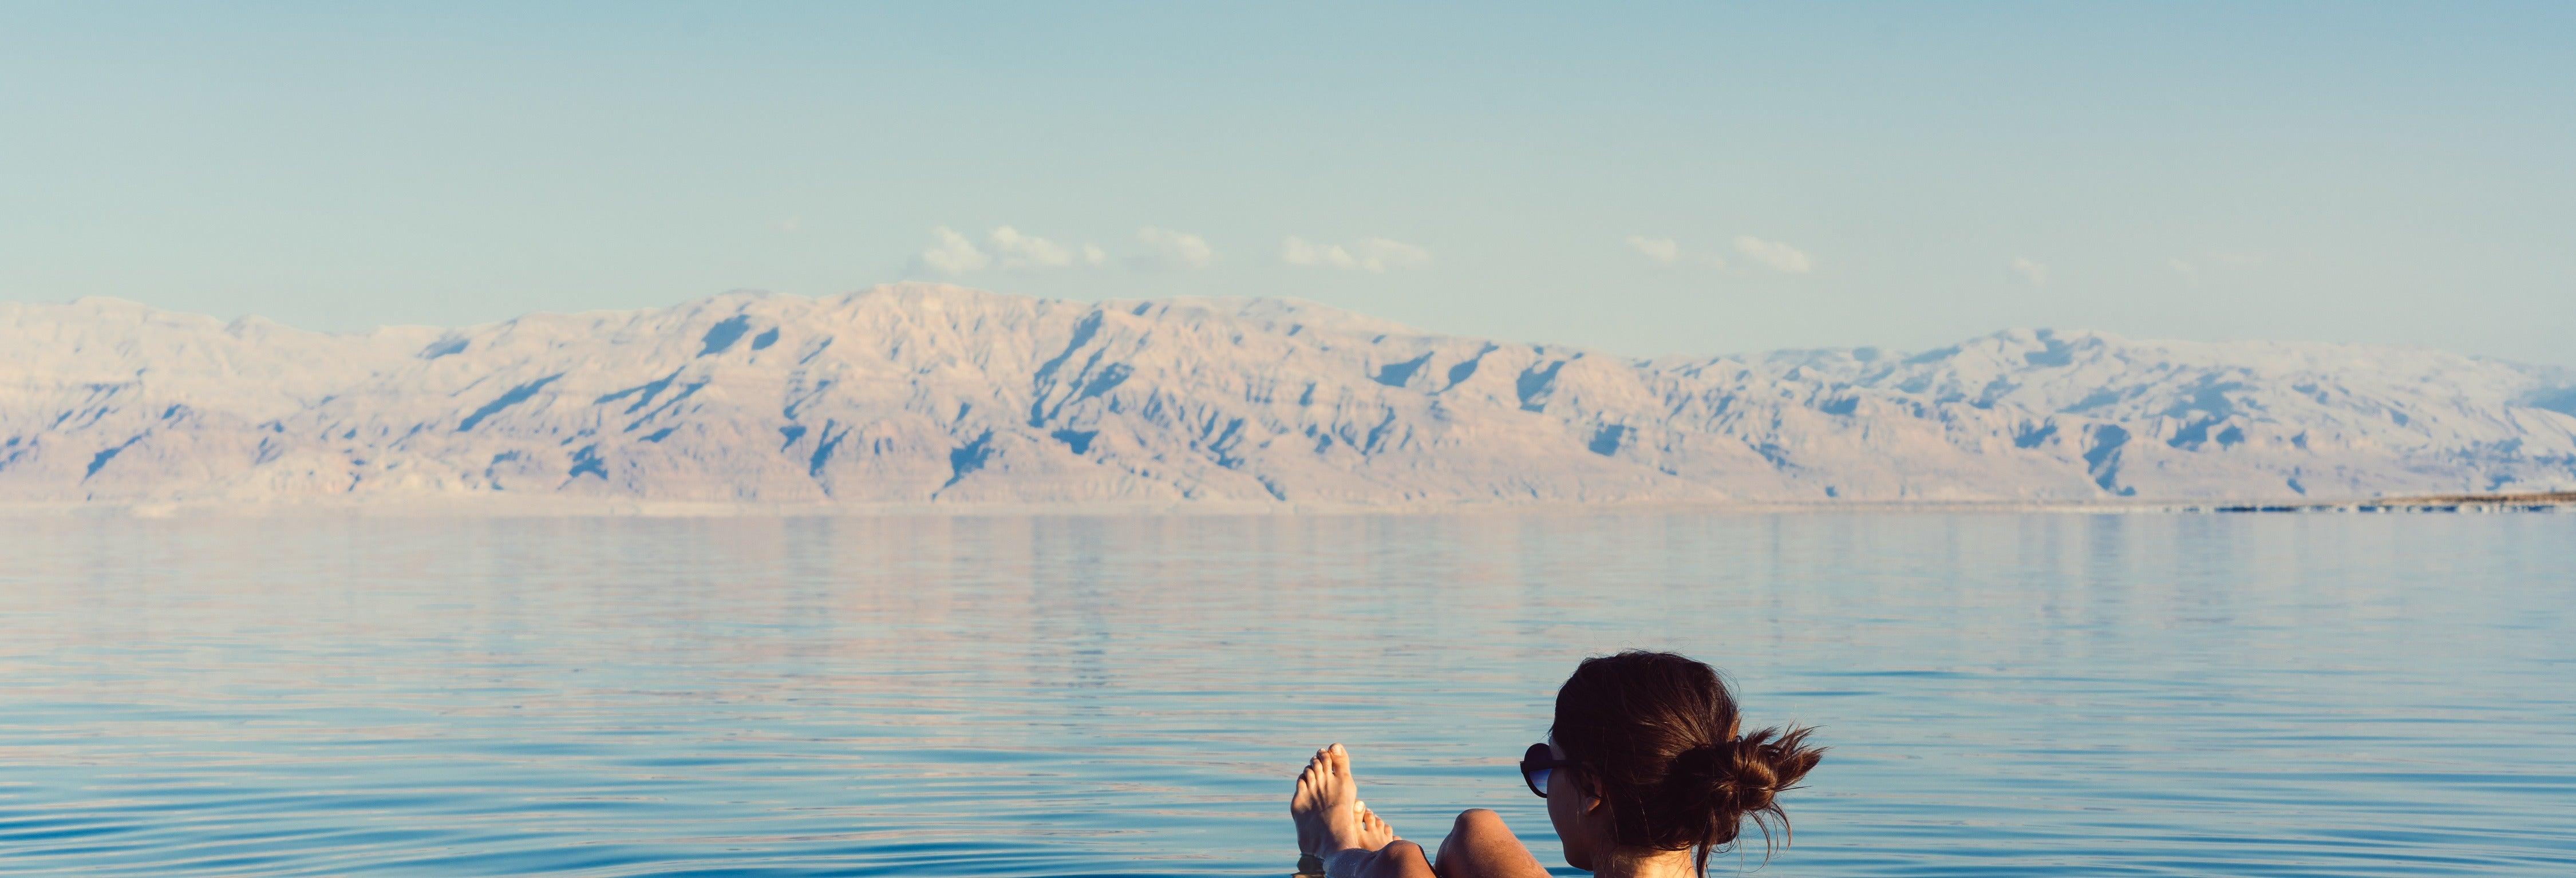 Mar Morto, Madaba e Monte Nebo